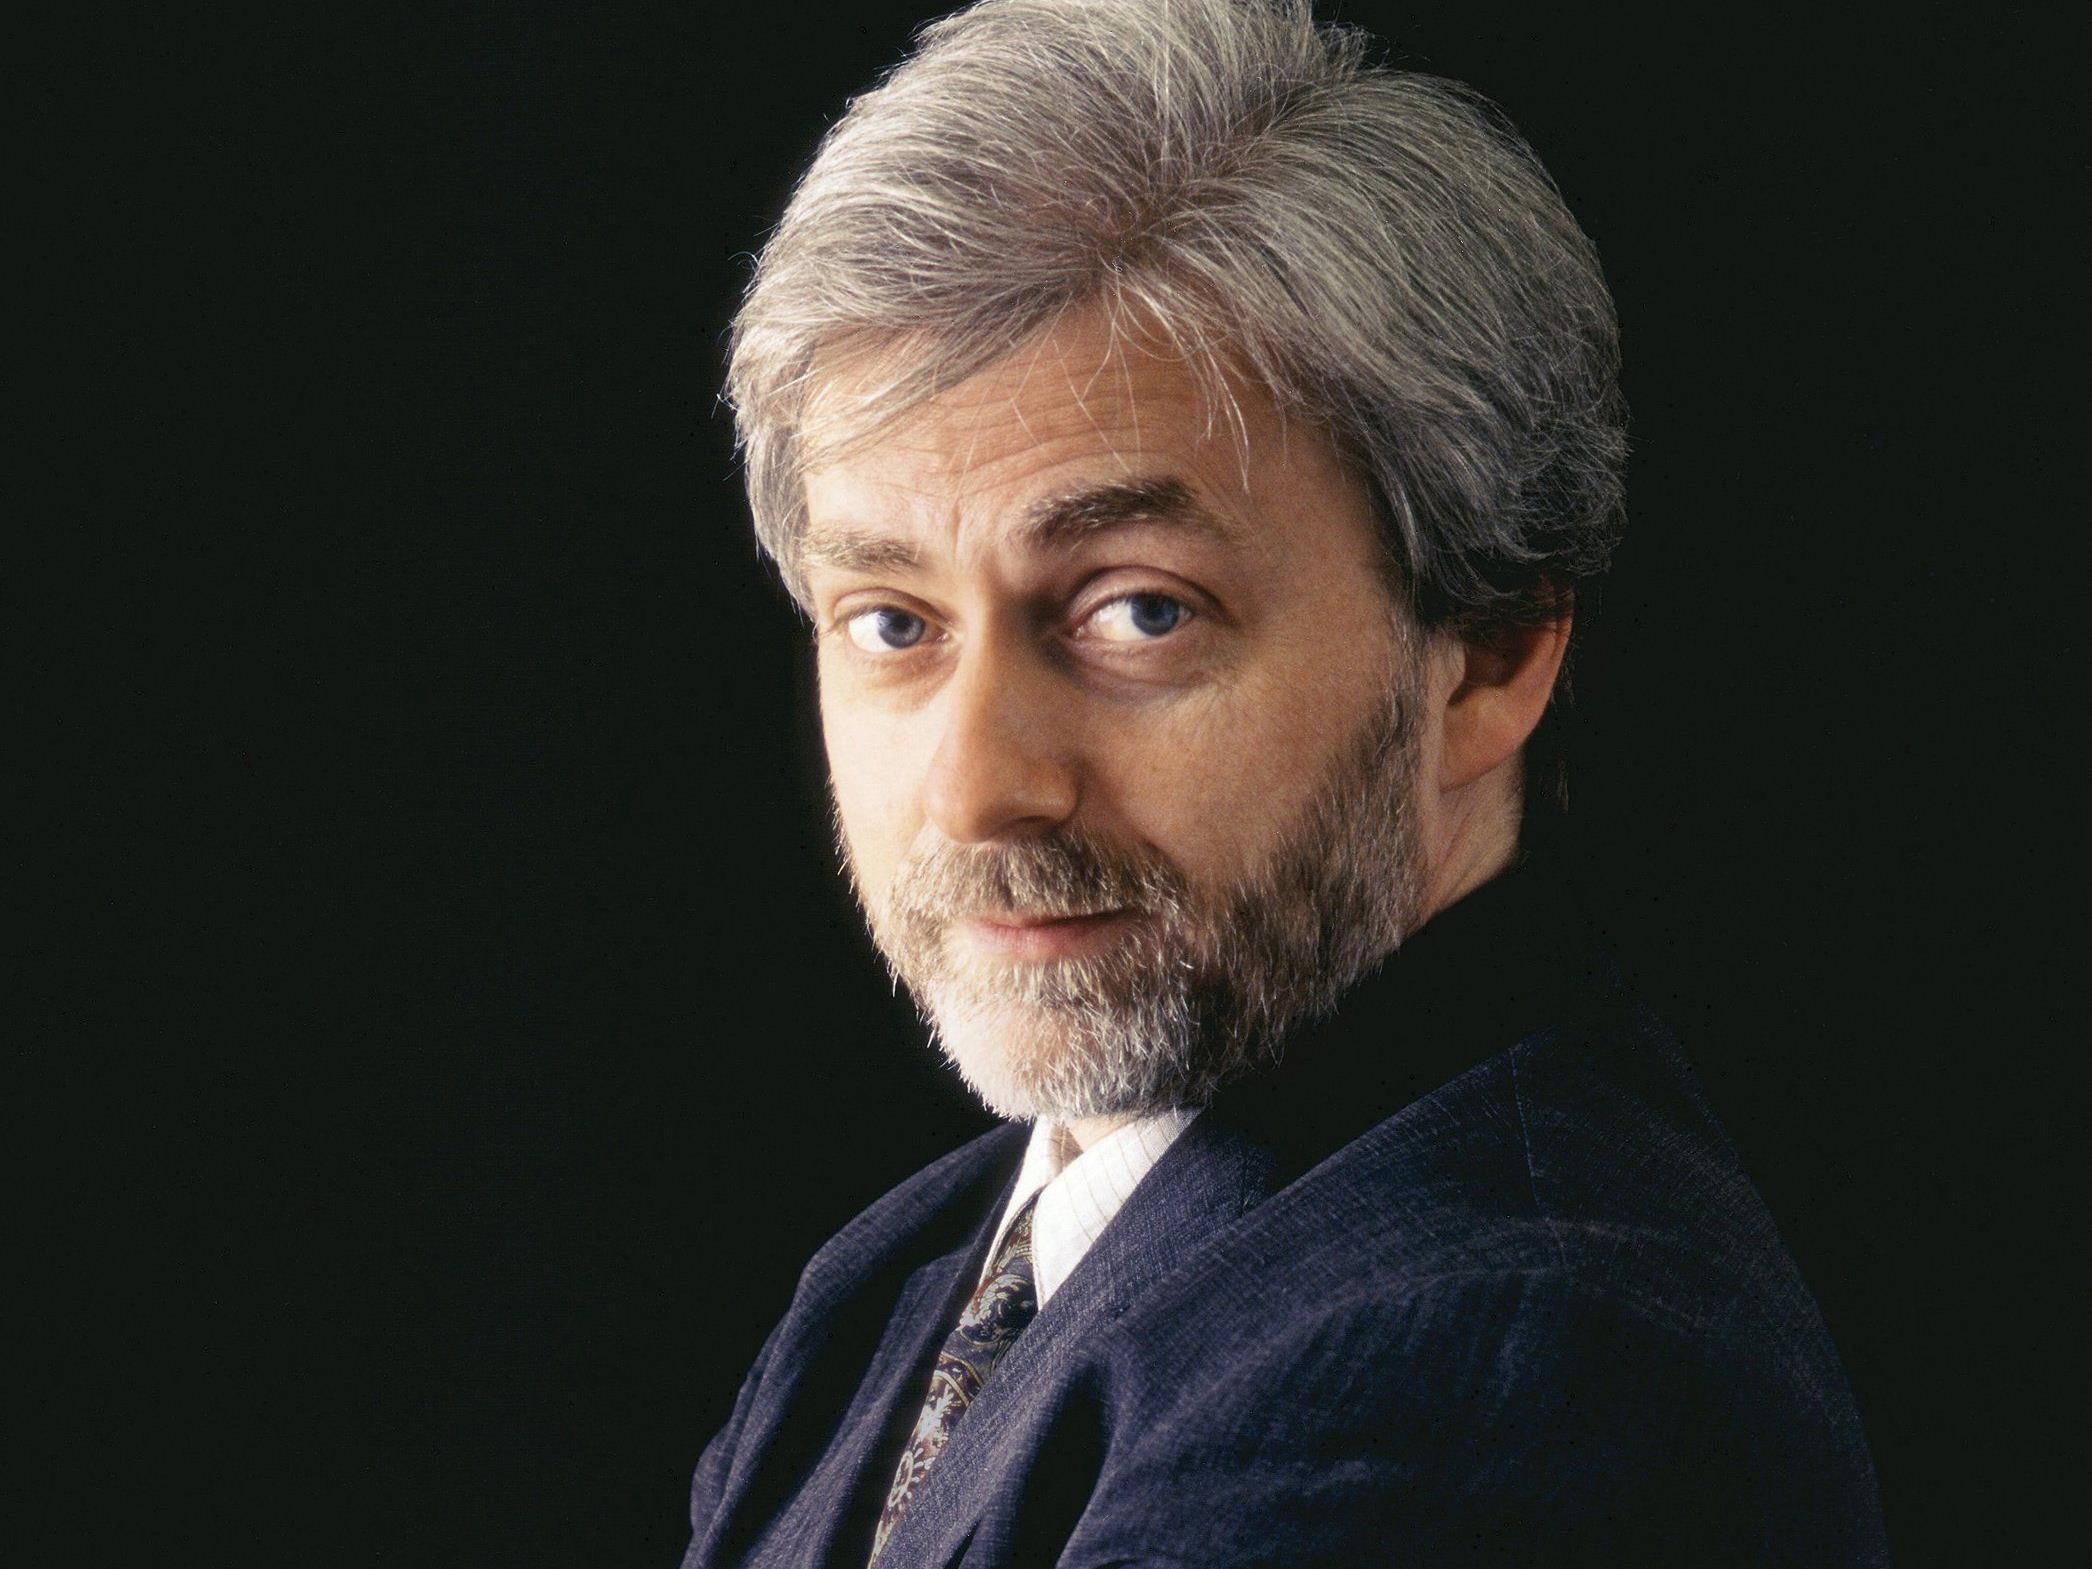 Der polnische Meisterpianist Krystian Zimerman.